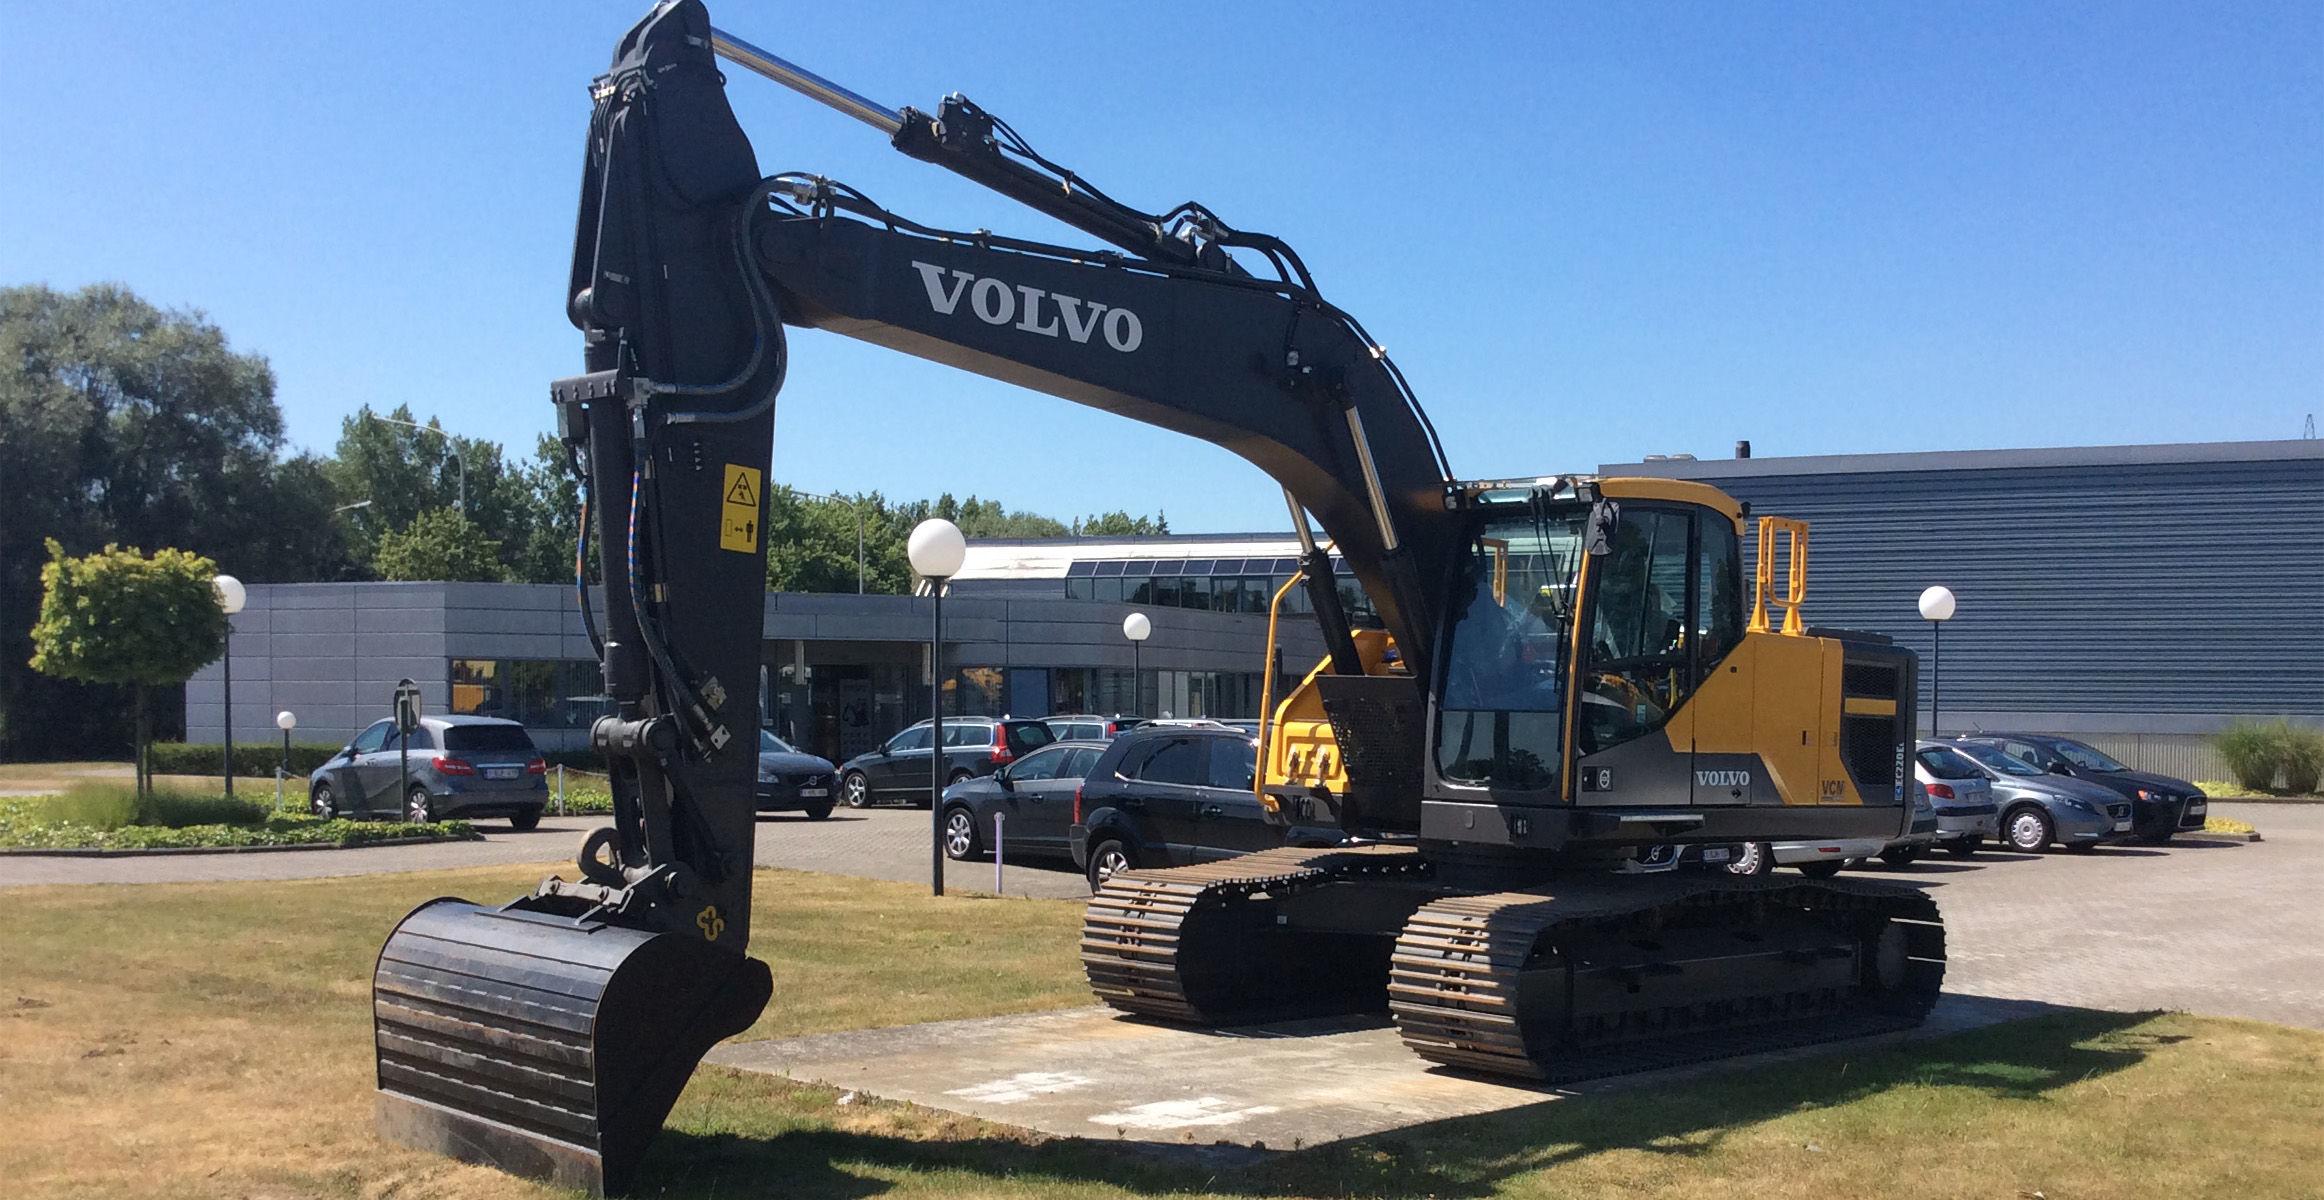 concessionnaire volvo : volvo construction equipment